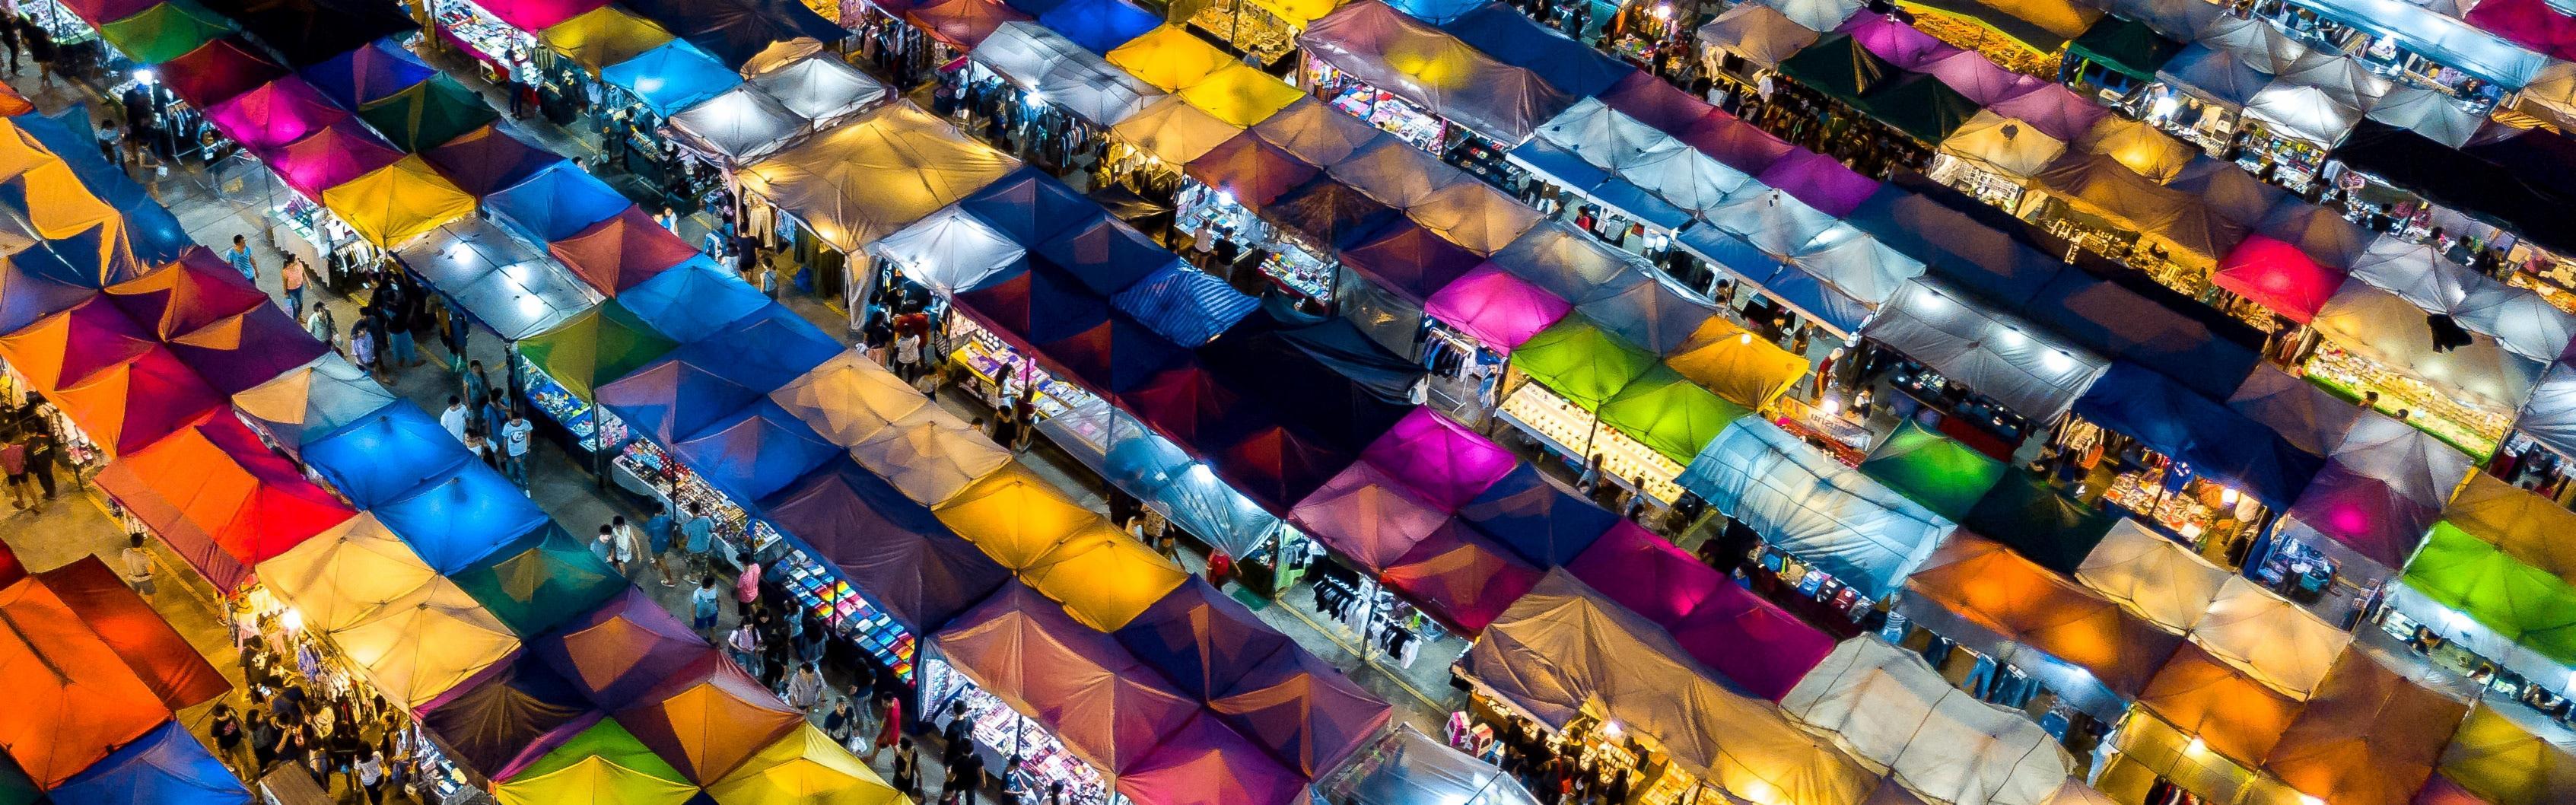 Global Marketplace Optimization: Three Key Considerations